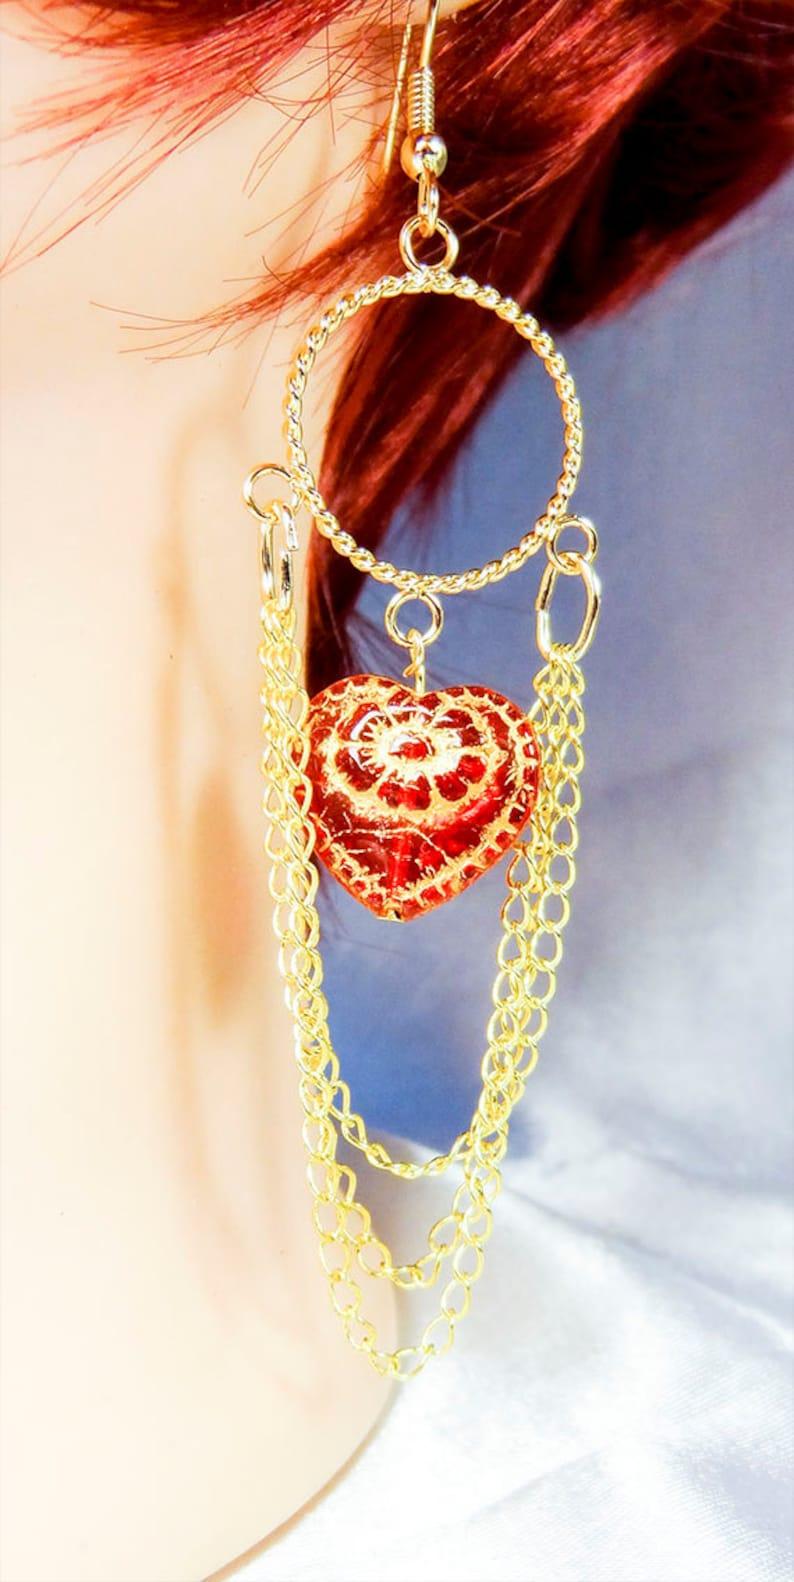 Valentine jewelry Valentine earring heart gold finish chain HEART EARRINGS 1306HO gold trim on heart heart jewelry red glass hearts